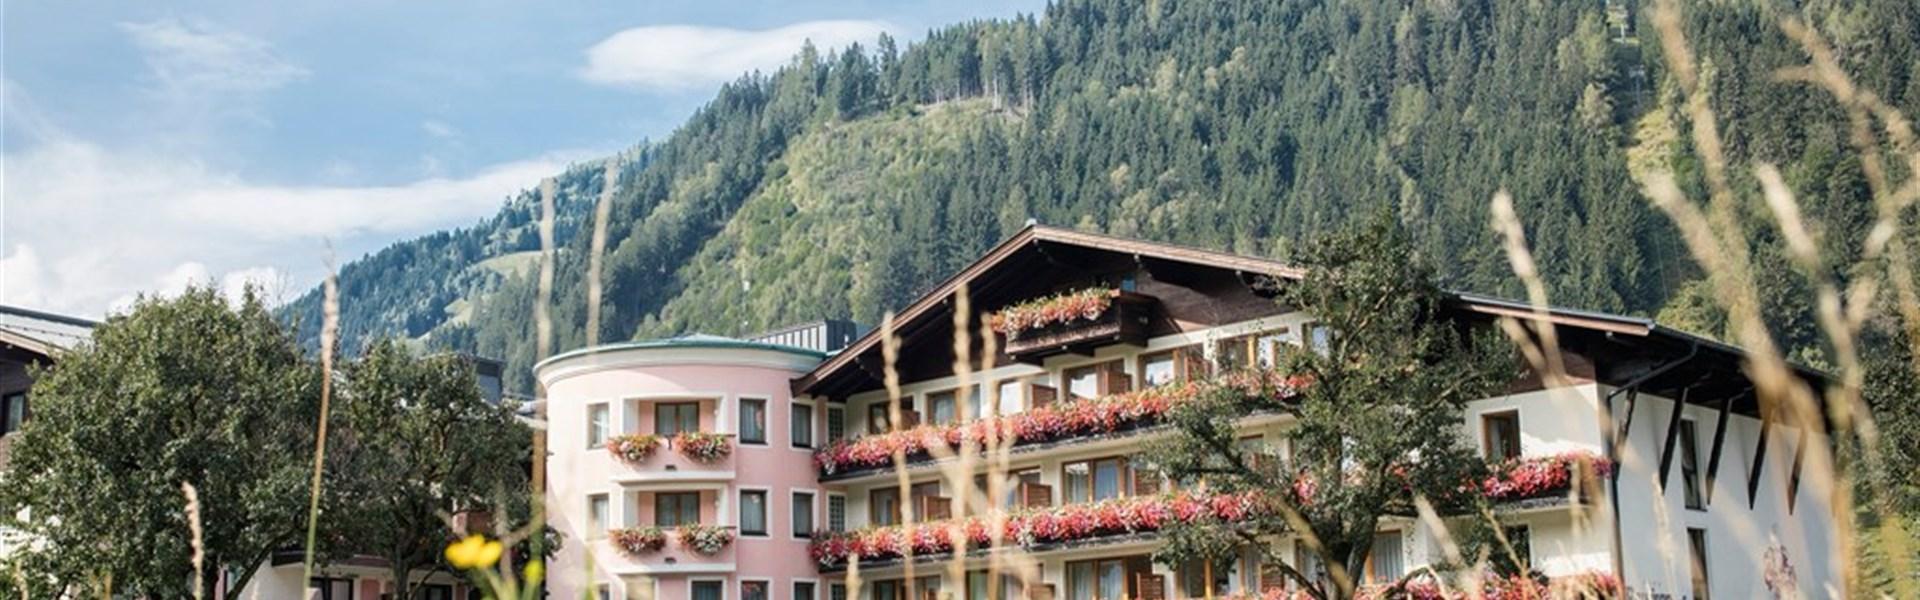 Marco Polo - Hotel Rauriserhof -